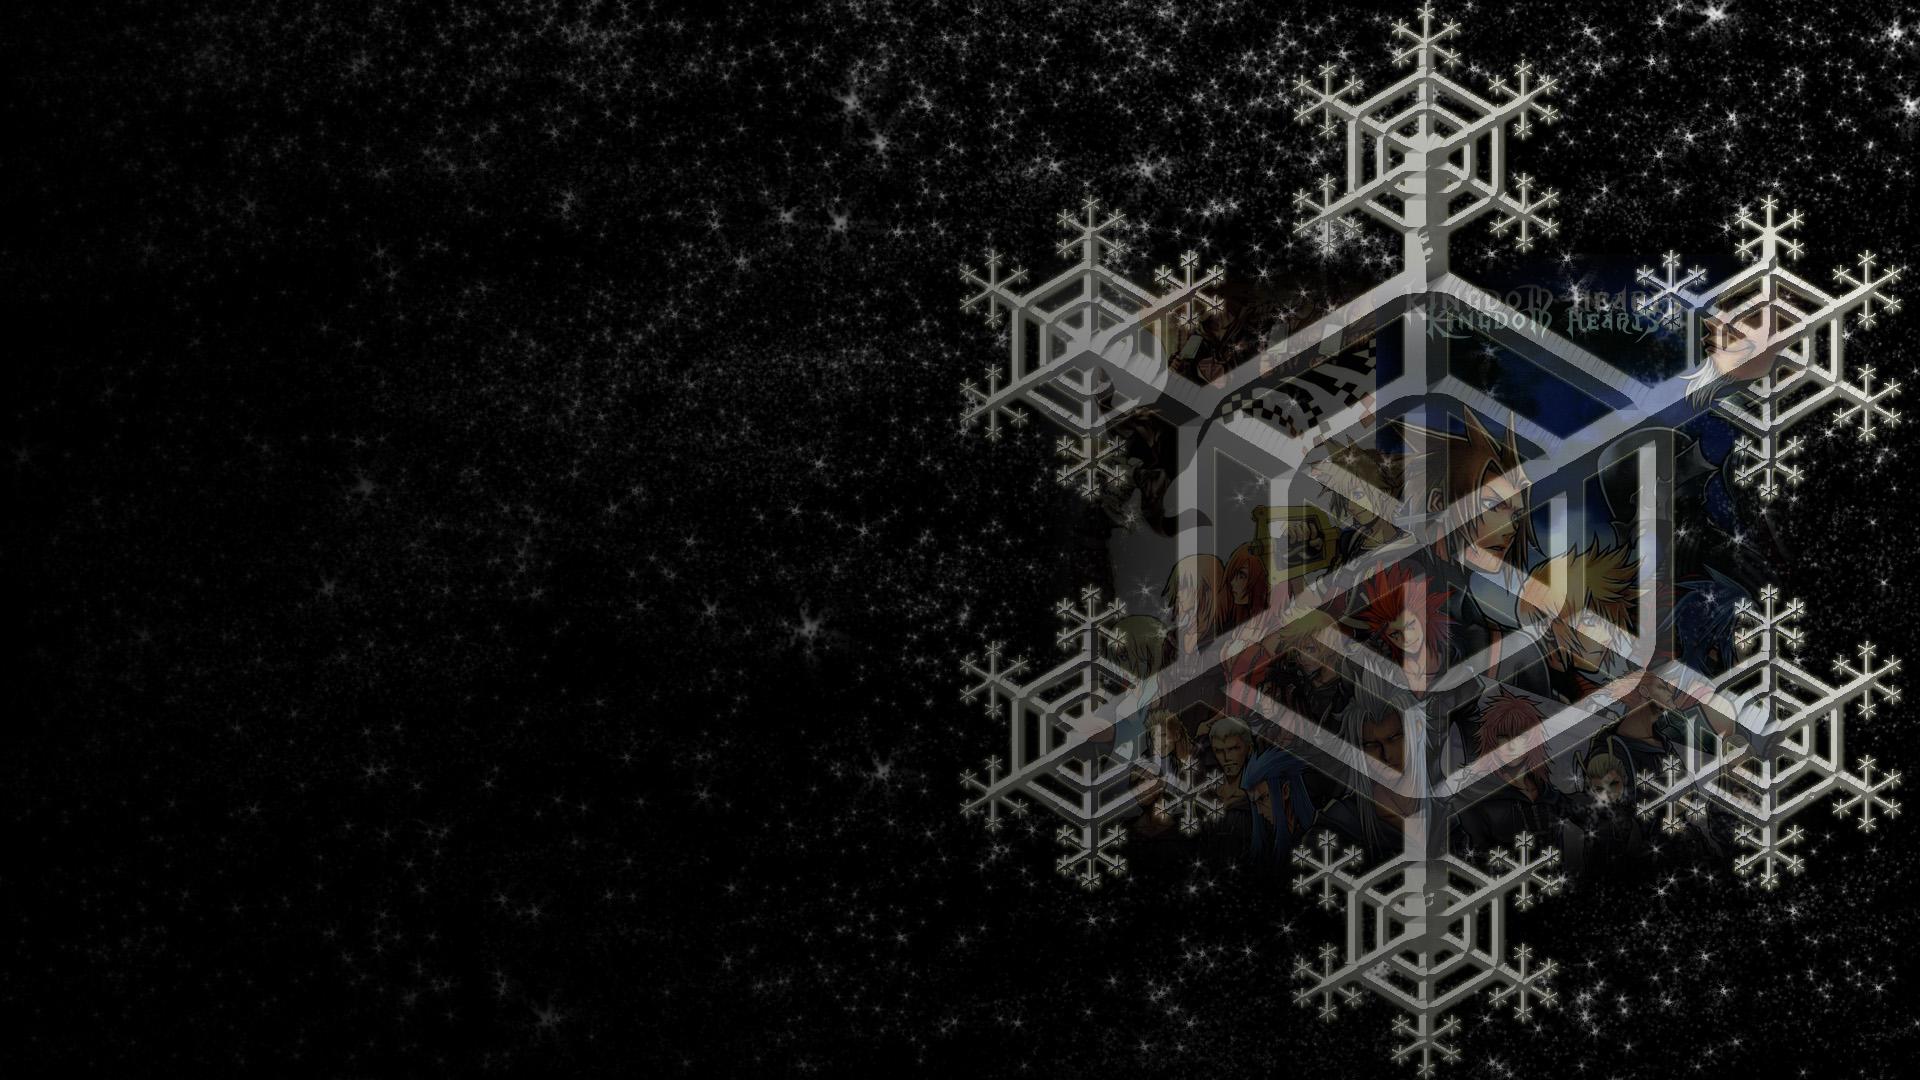 Kingdom Hearts Wallpaper 1920 x 1080 by txvirus on DeviantArt